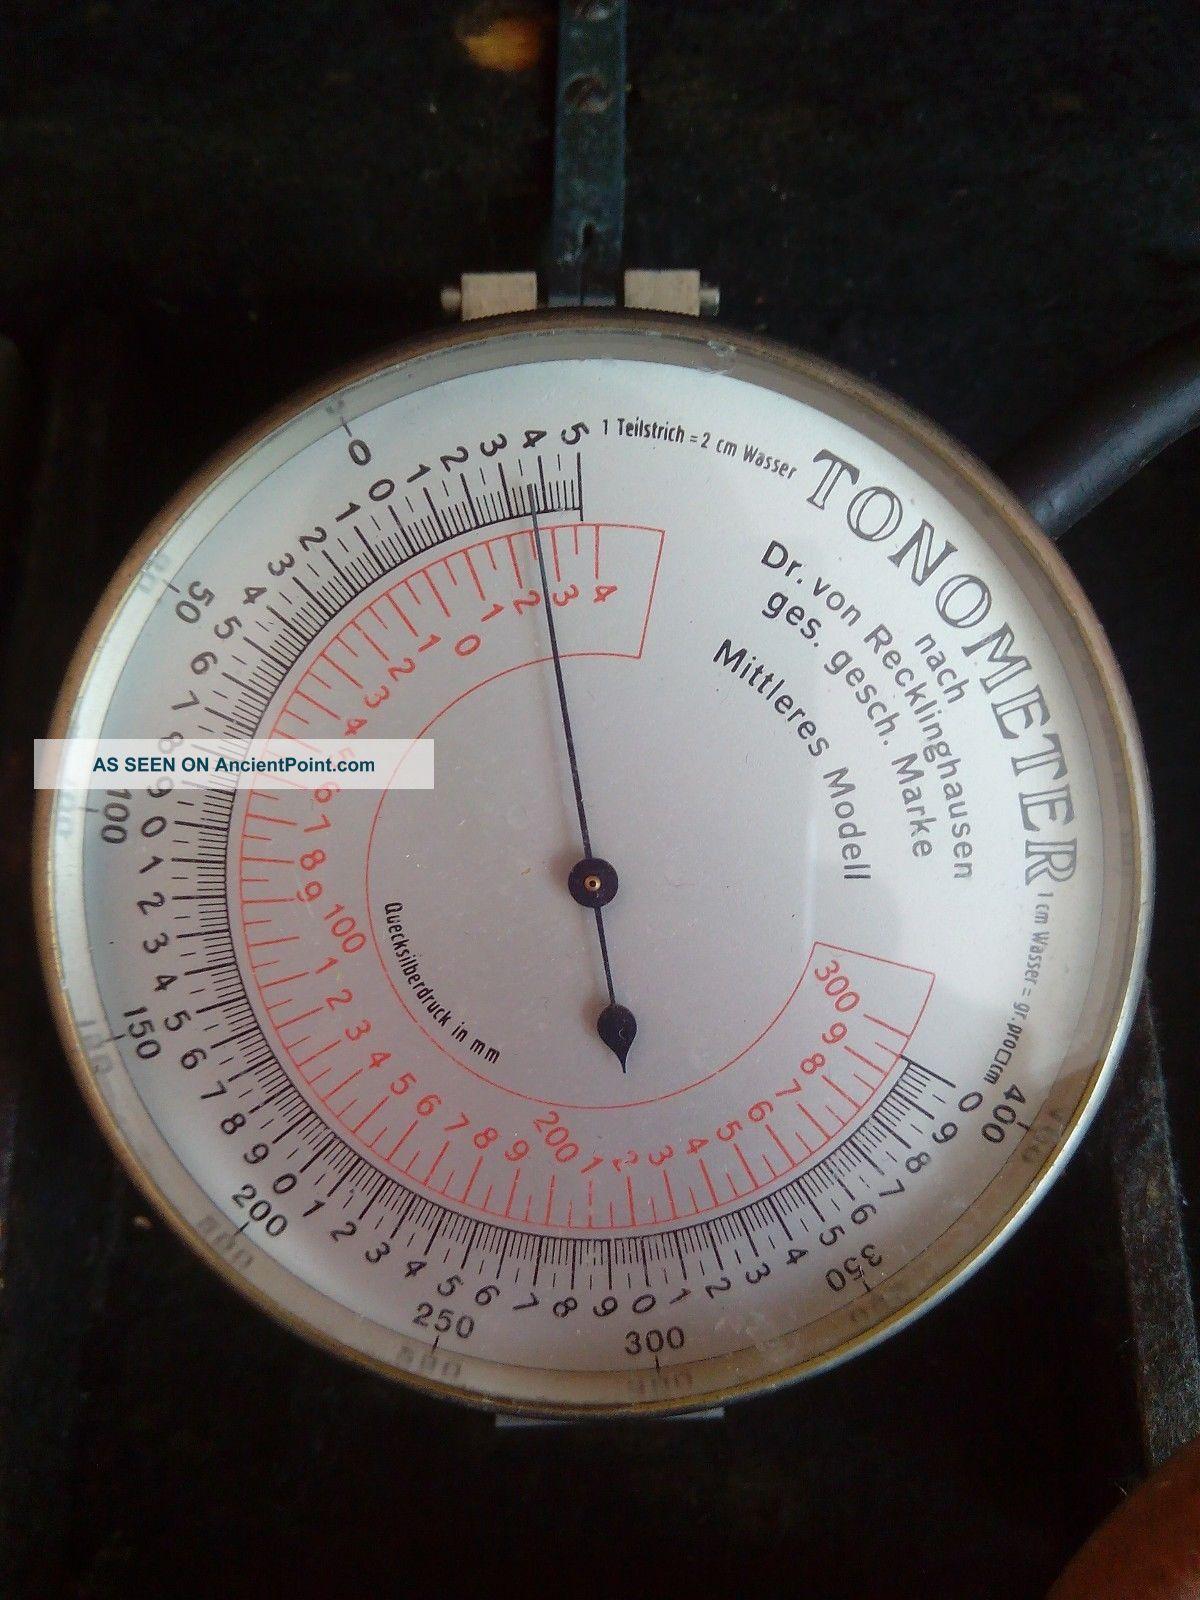 Antique Doctor ' S Tonometer To Measure Blood Presure - Nurce Medical - Rare Other Medical Antiques photo